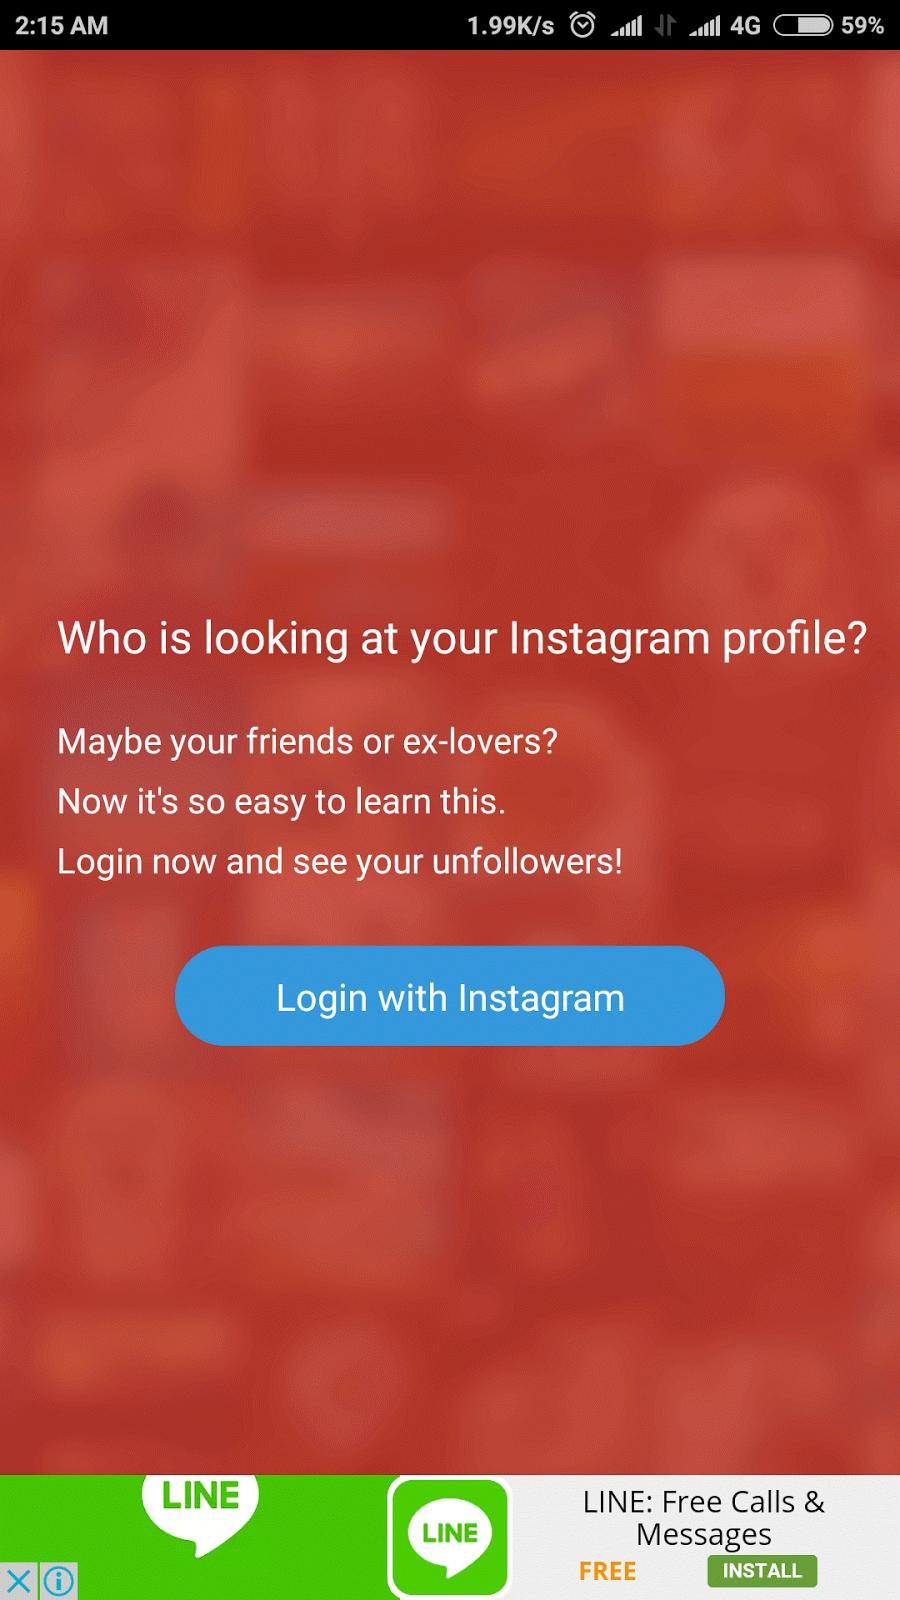 Cara Mengetahui Stalker Akun Instagram Instagram Pengetahuan Ungkapan